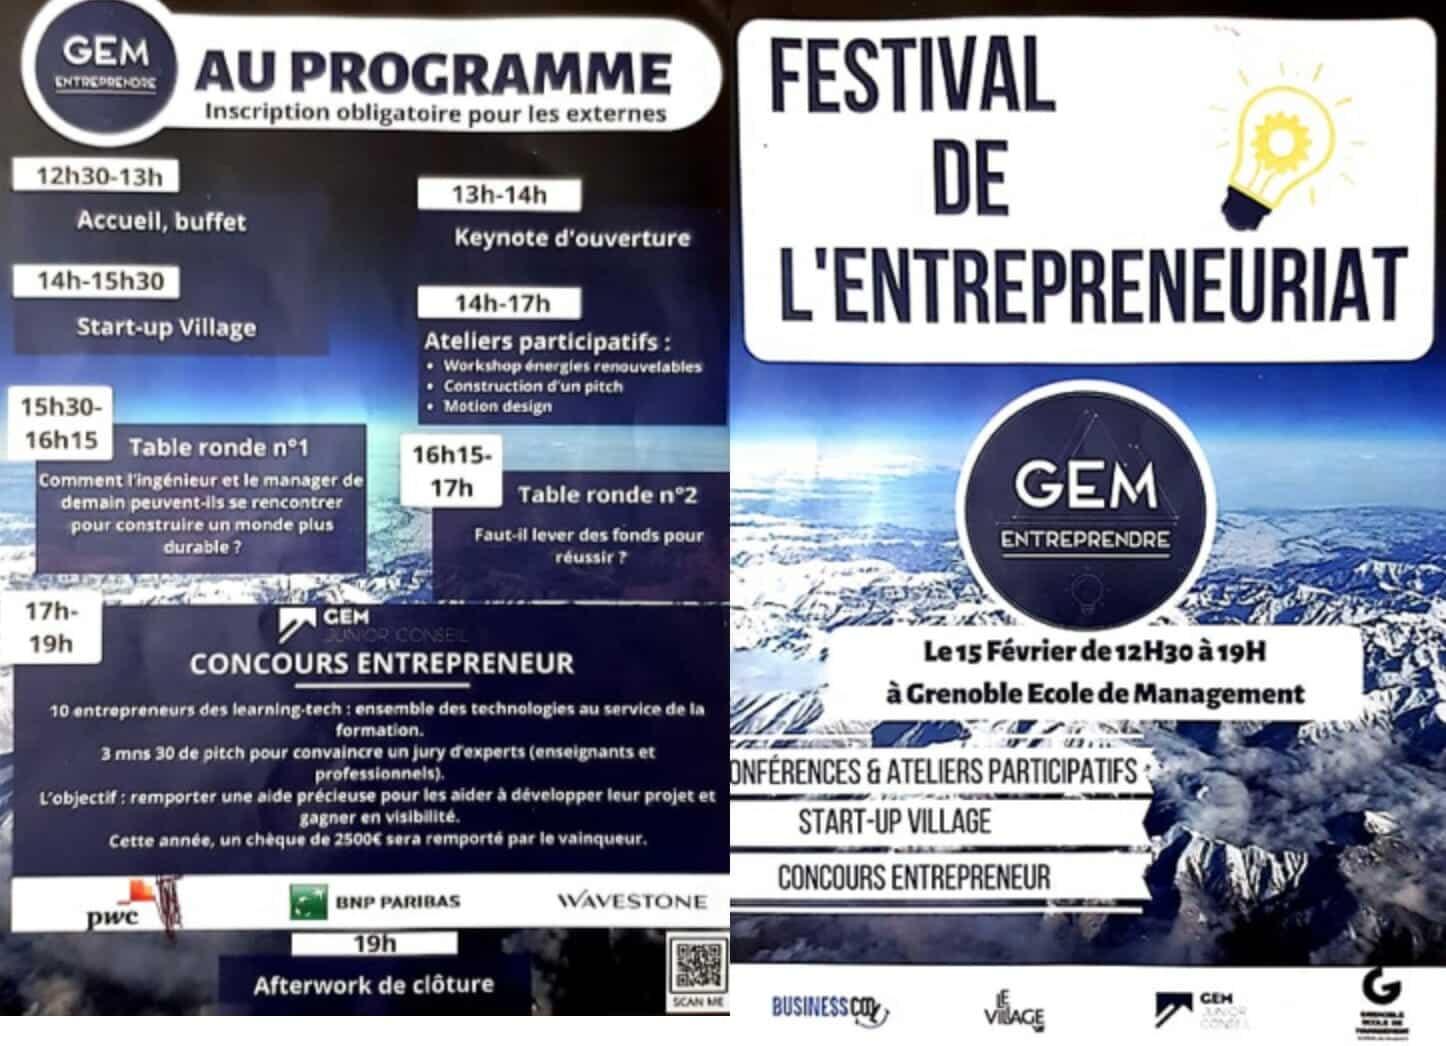 Festival de l'entrepreneuriat